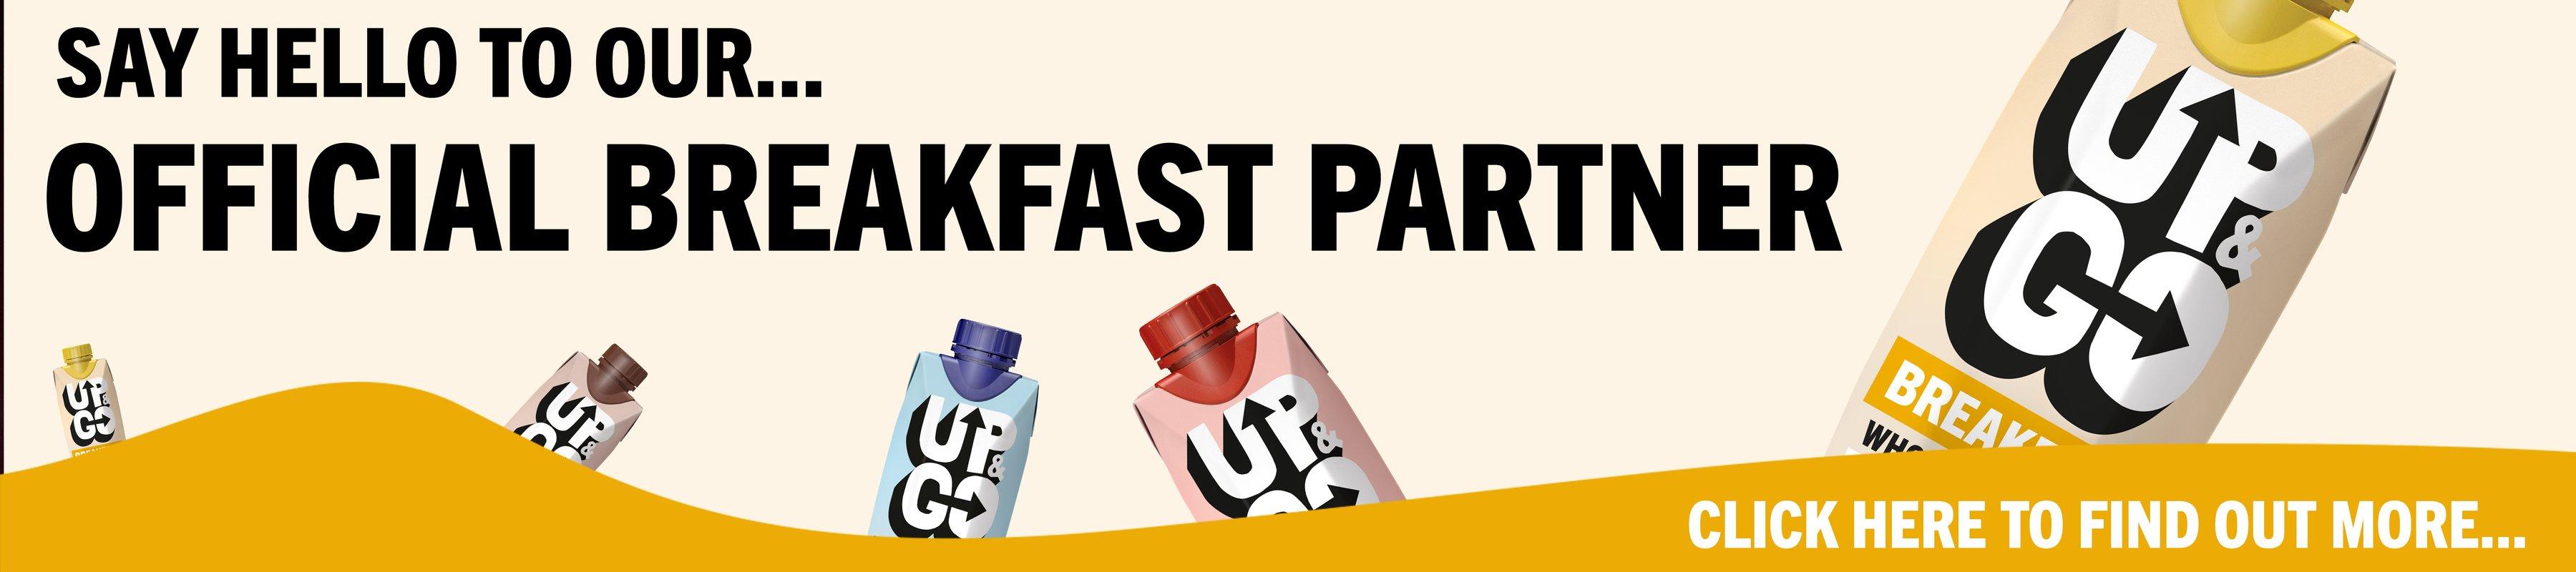 UP&GO Website Banner